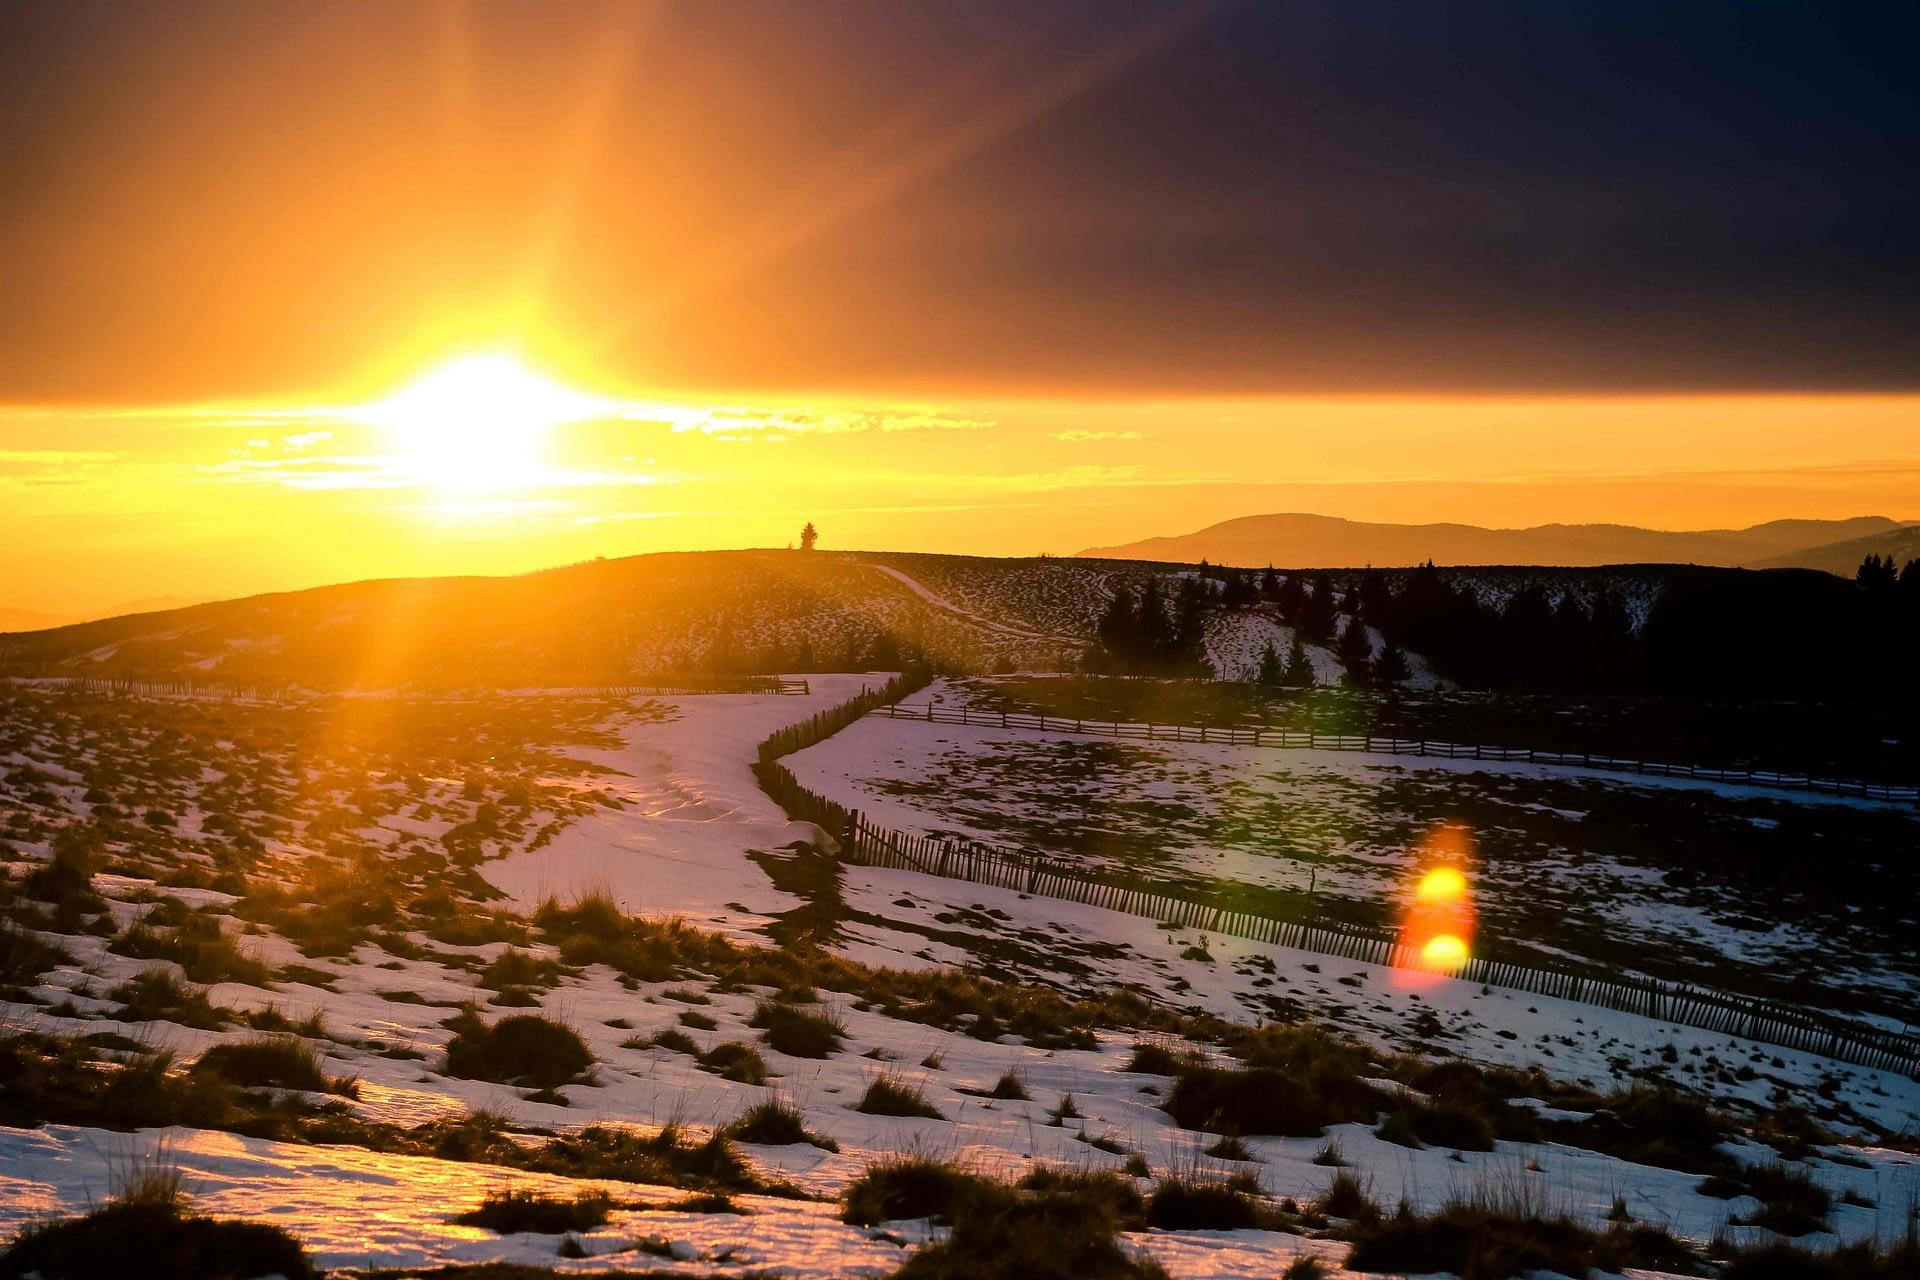 peisaj de iarna in muntiii grohotisului